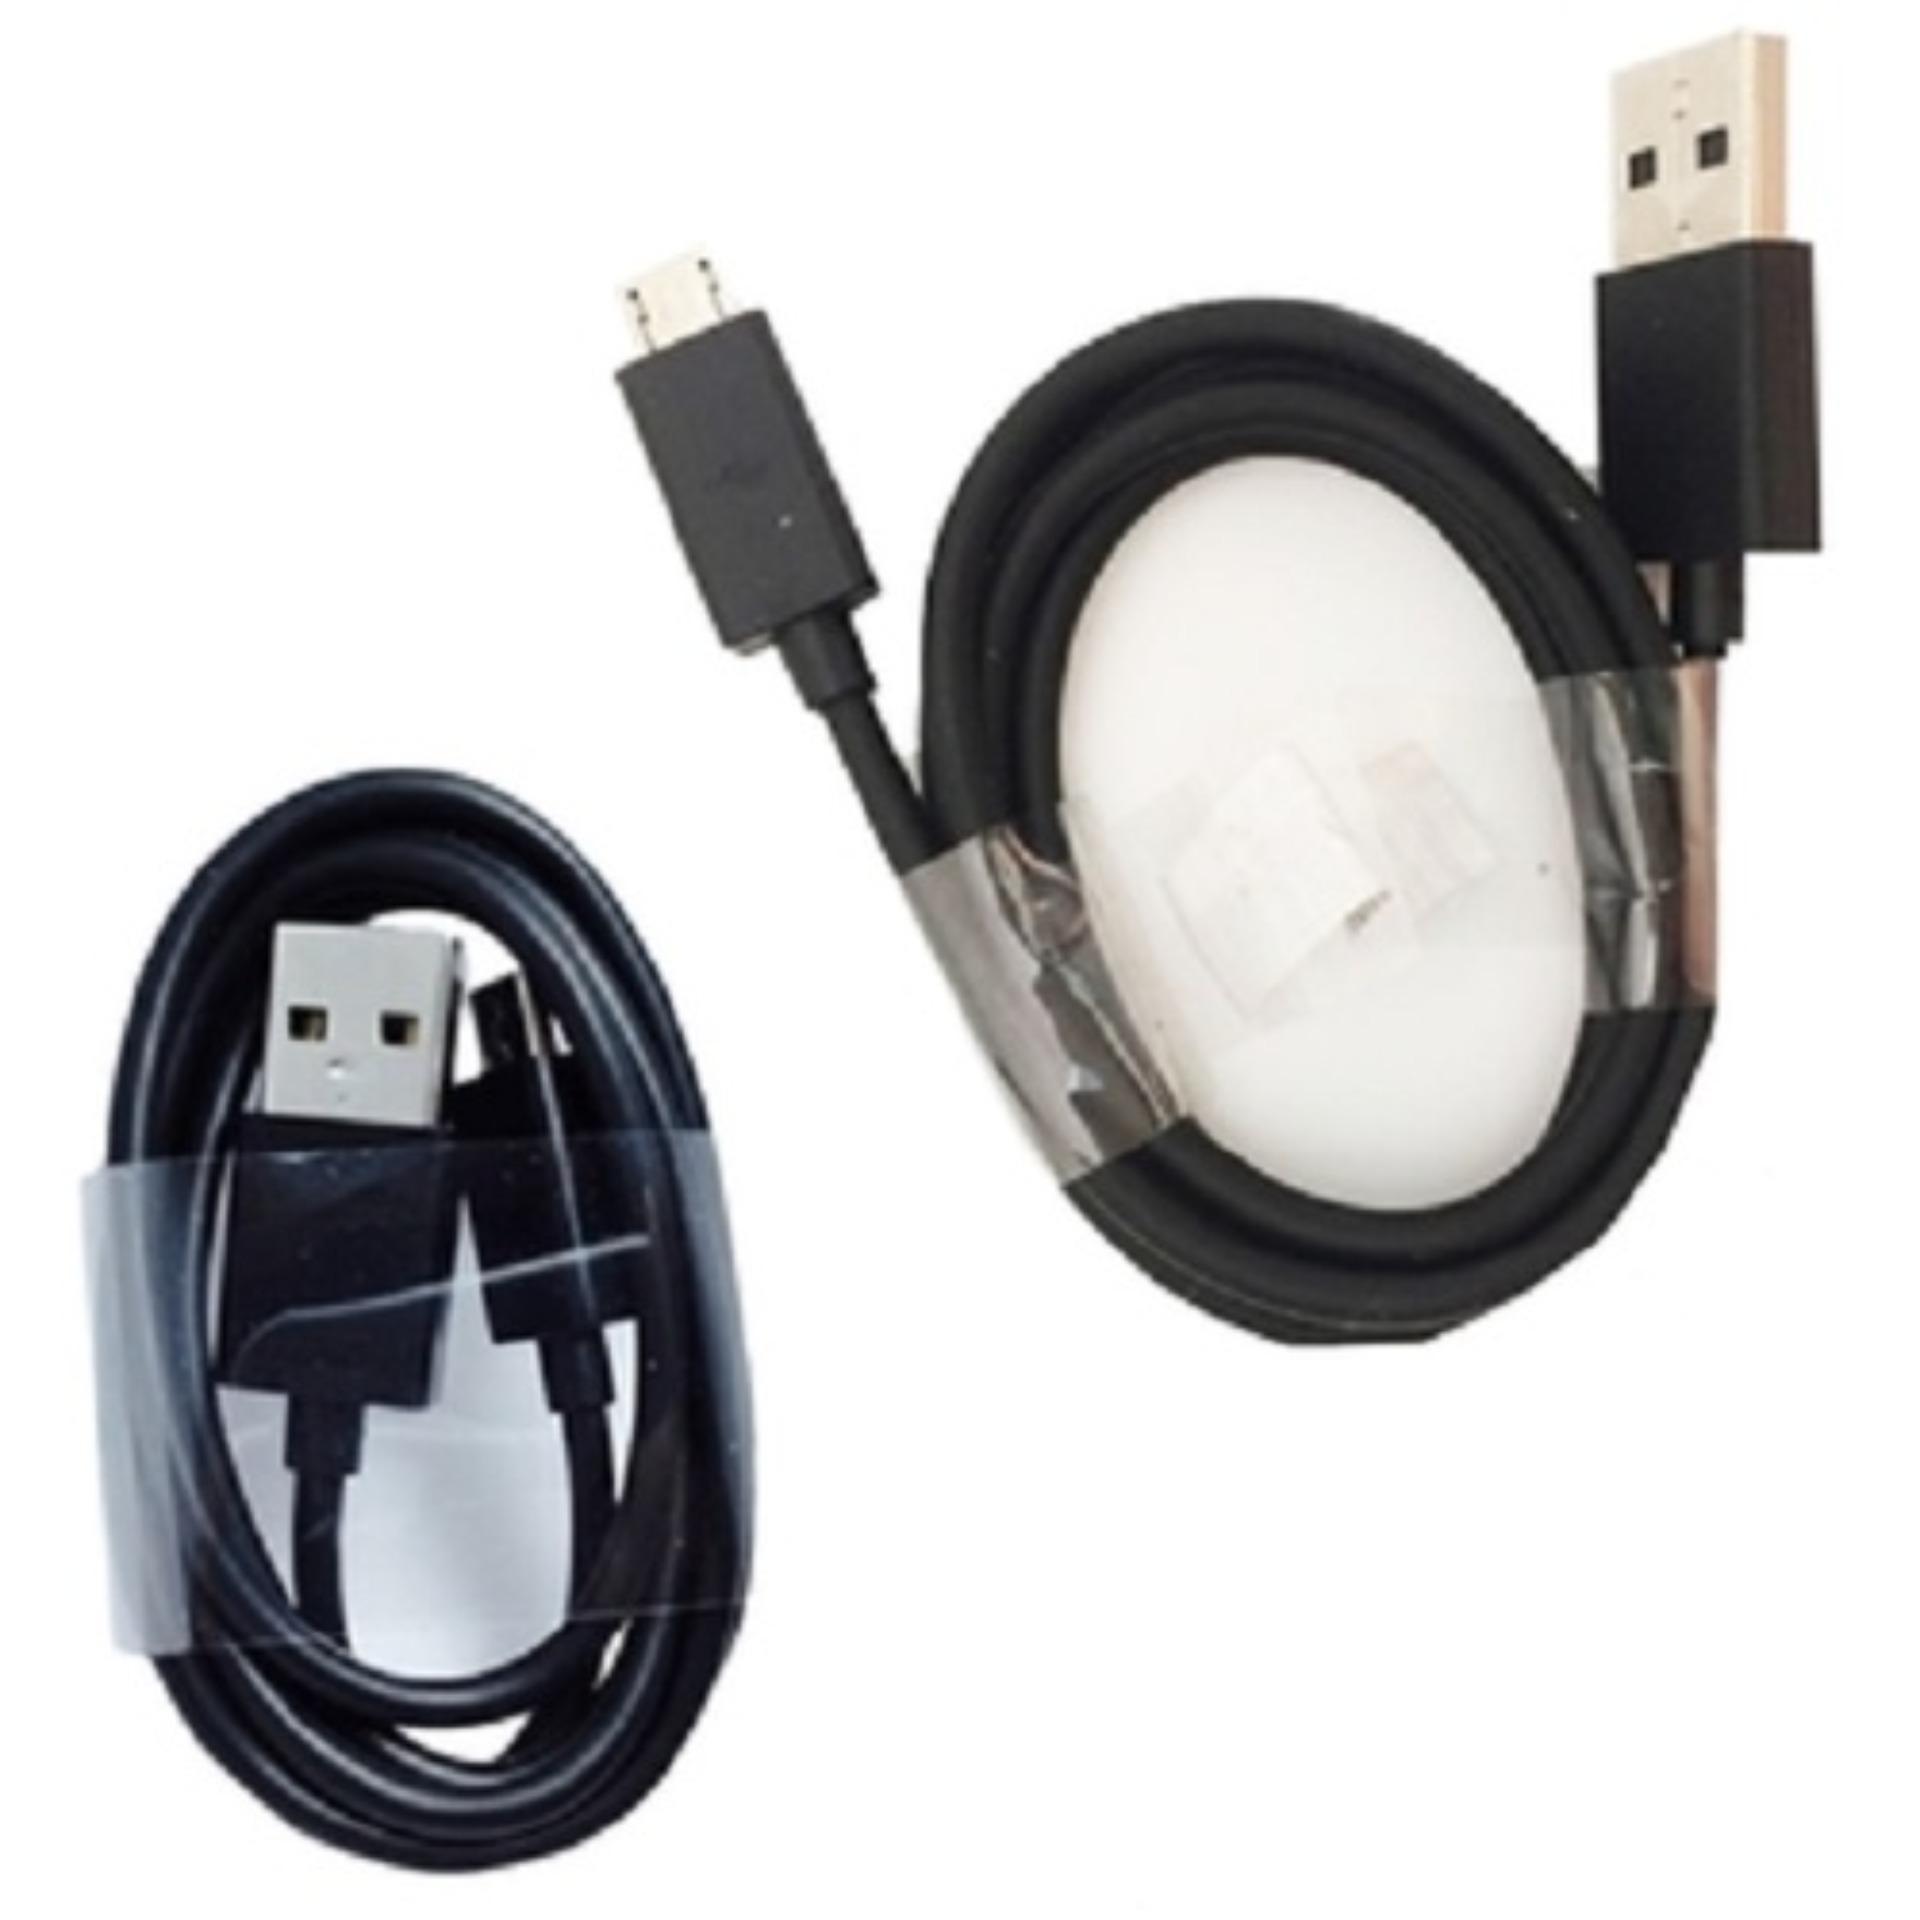 Kabel Data For Asus Zenfone Micro USB Fast Charging Data Cable Kualitas Original ORI - Bisa Untuk Vivo V1 V3 V9 V7 V7+ V5 LITE Y65 Y67 Y69 Y53 Y25 Y51 LG Optimus G Pro 2 Lite G2 Mini G3 Stylus S G4 G6 K8 K4 LTE